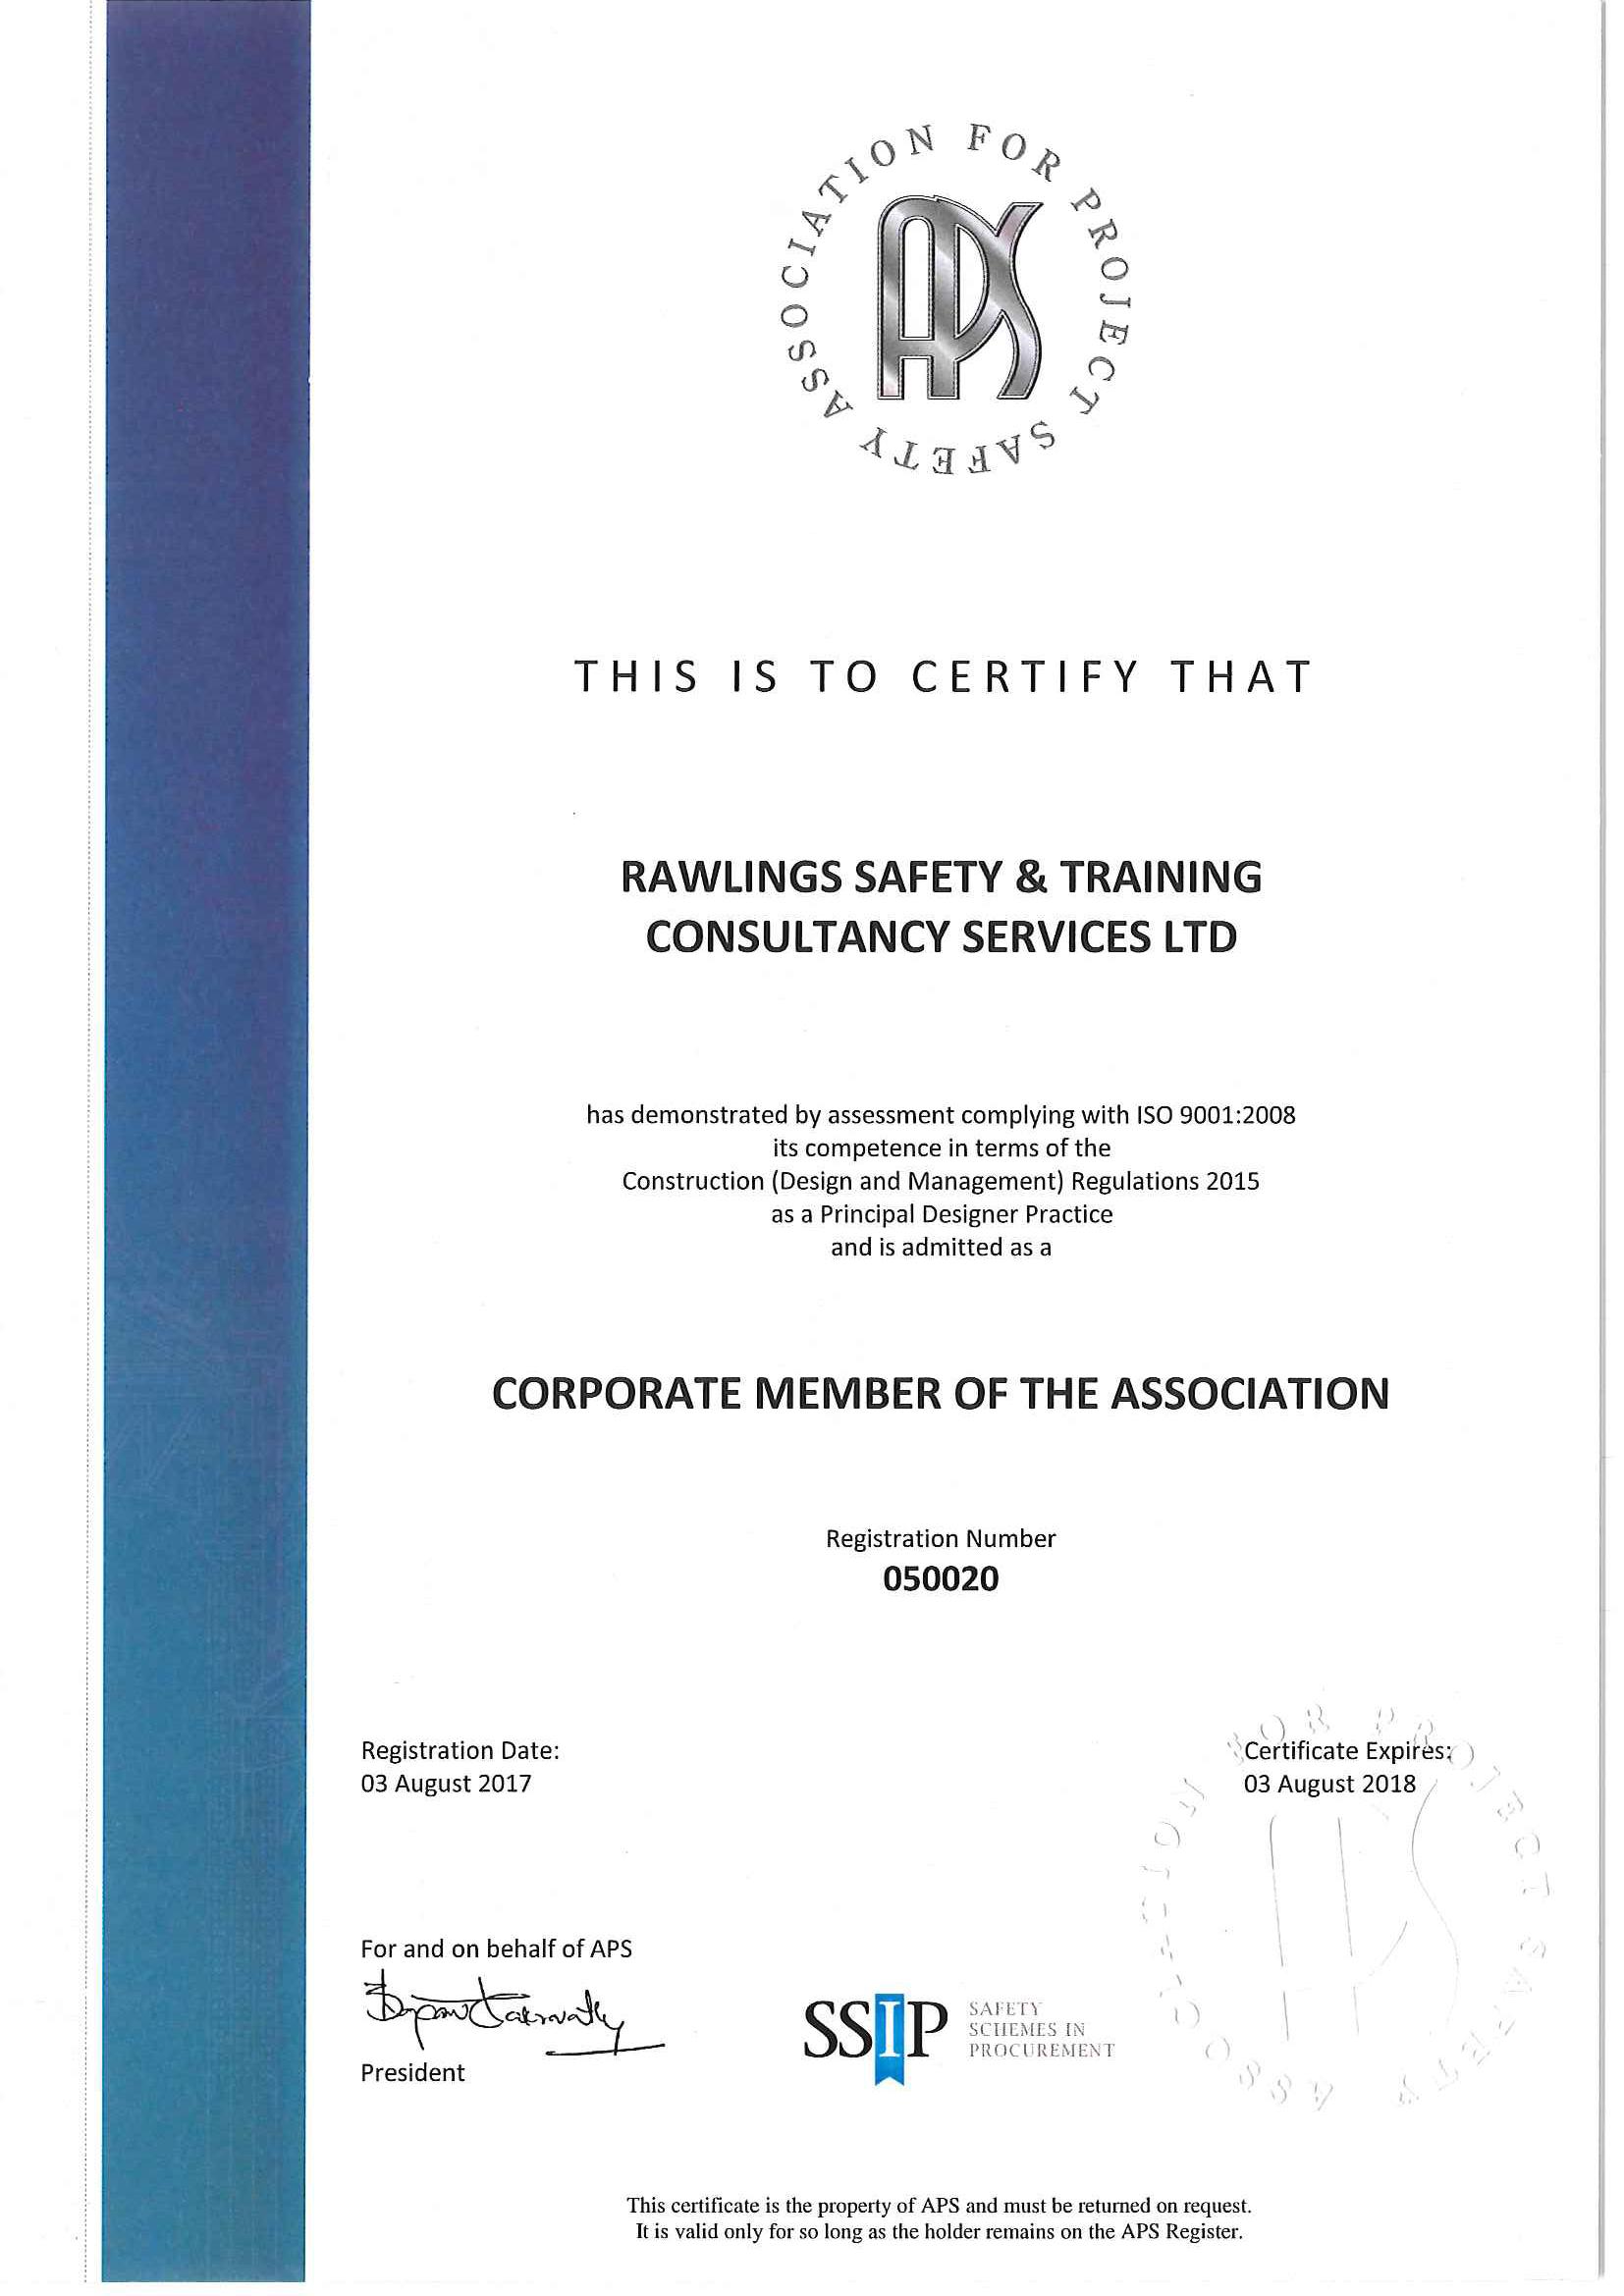 APS Corporate Certificate_